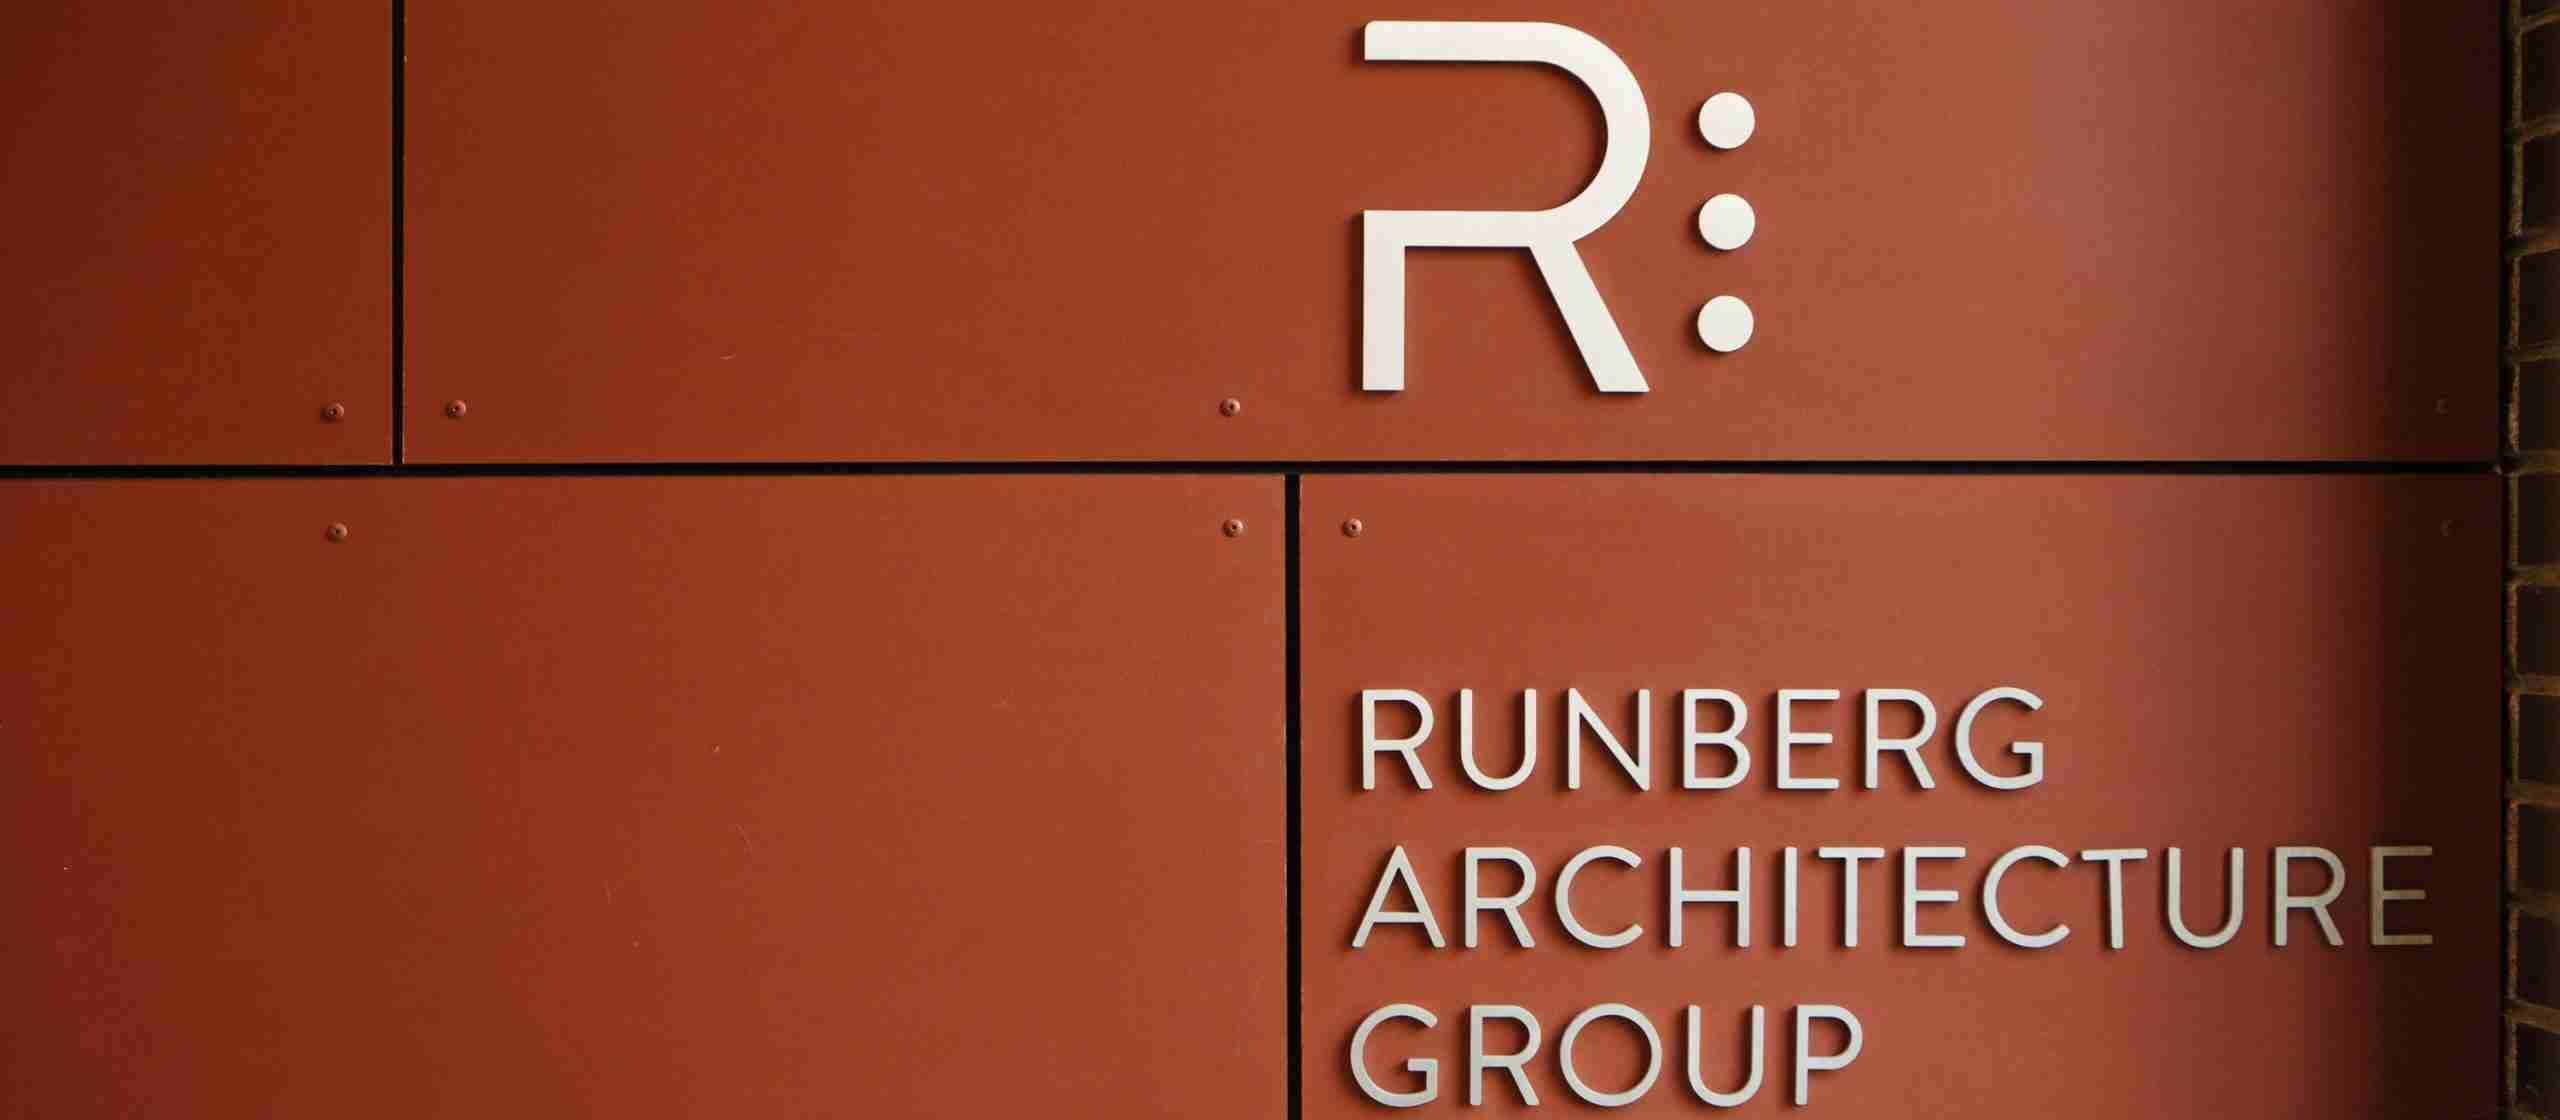 Runberg-Architecture-Group-Lobby